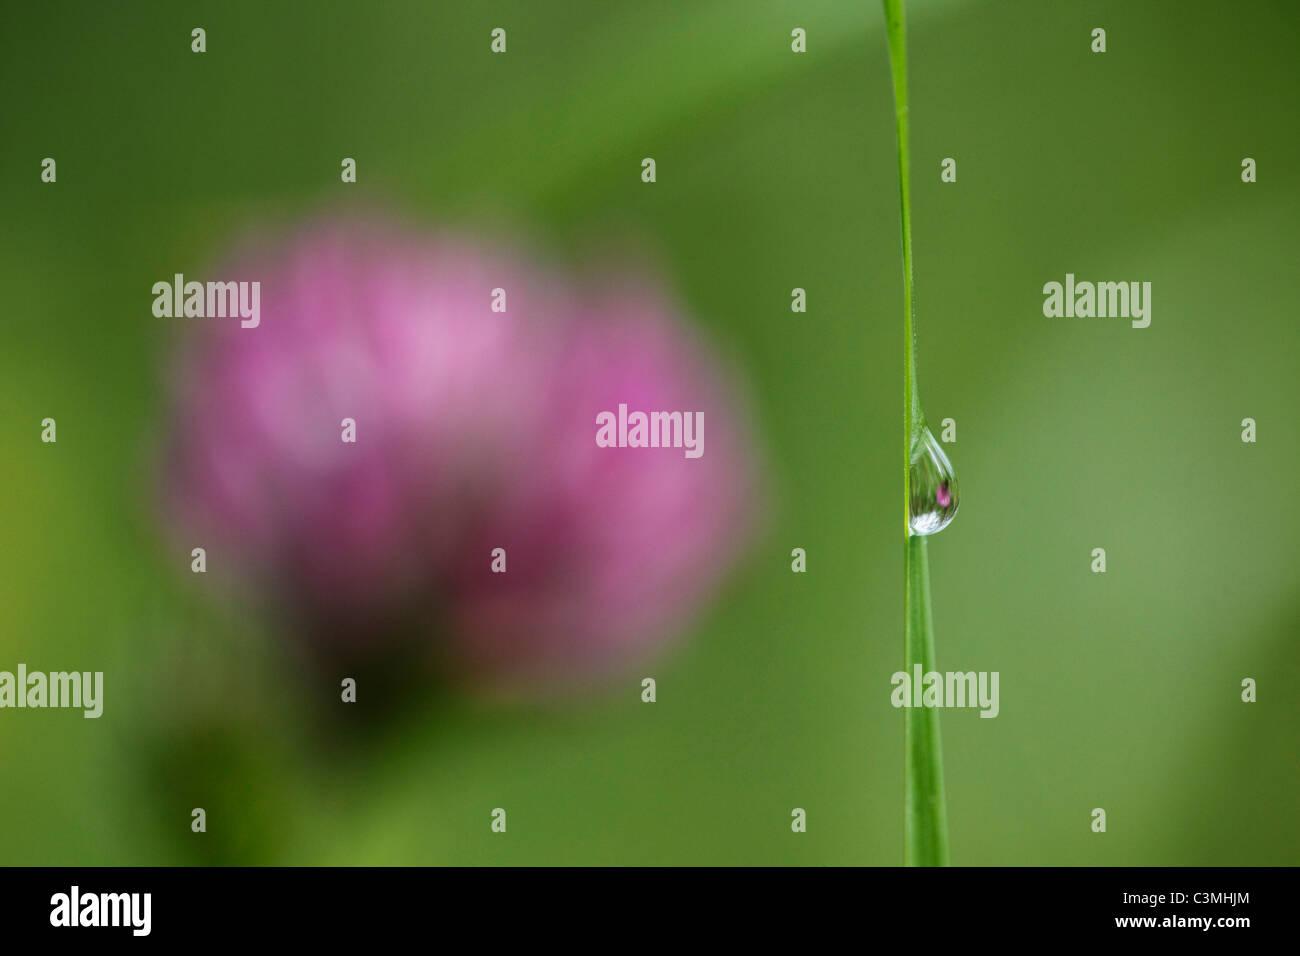 Alemania, la gota de agua sobre la hoja de hierba, close-up Imagen De Stock